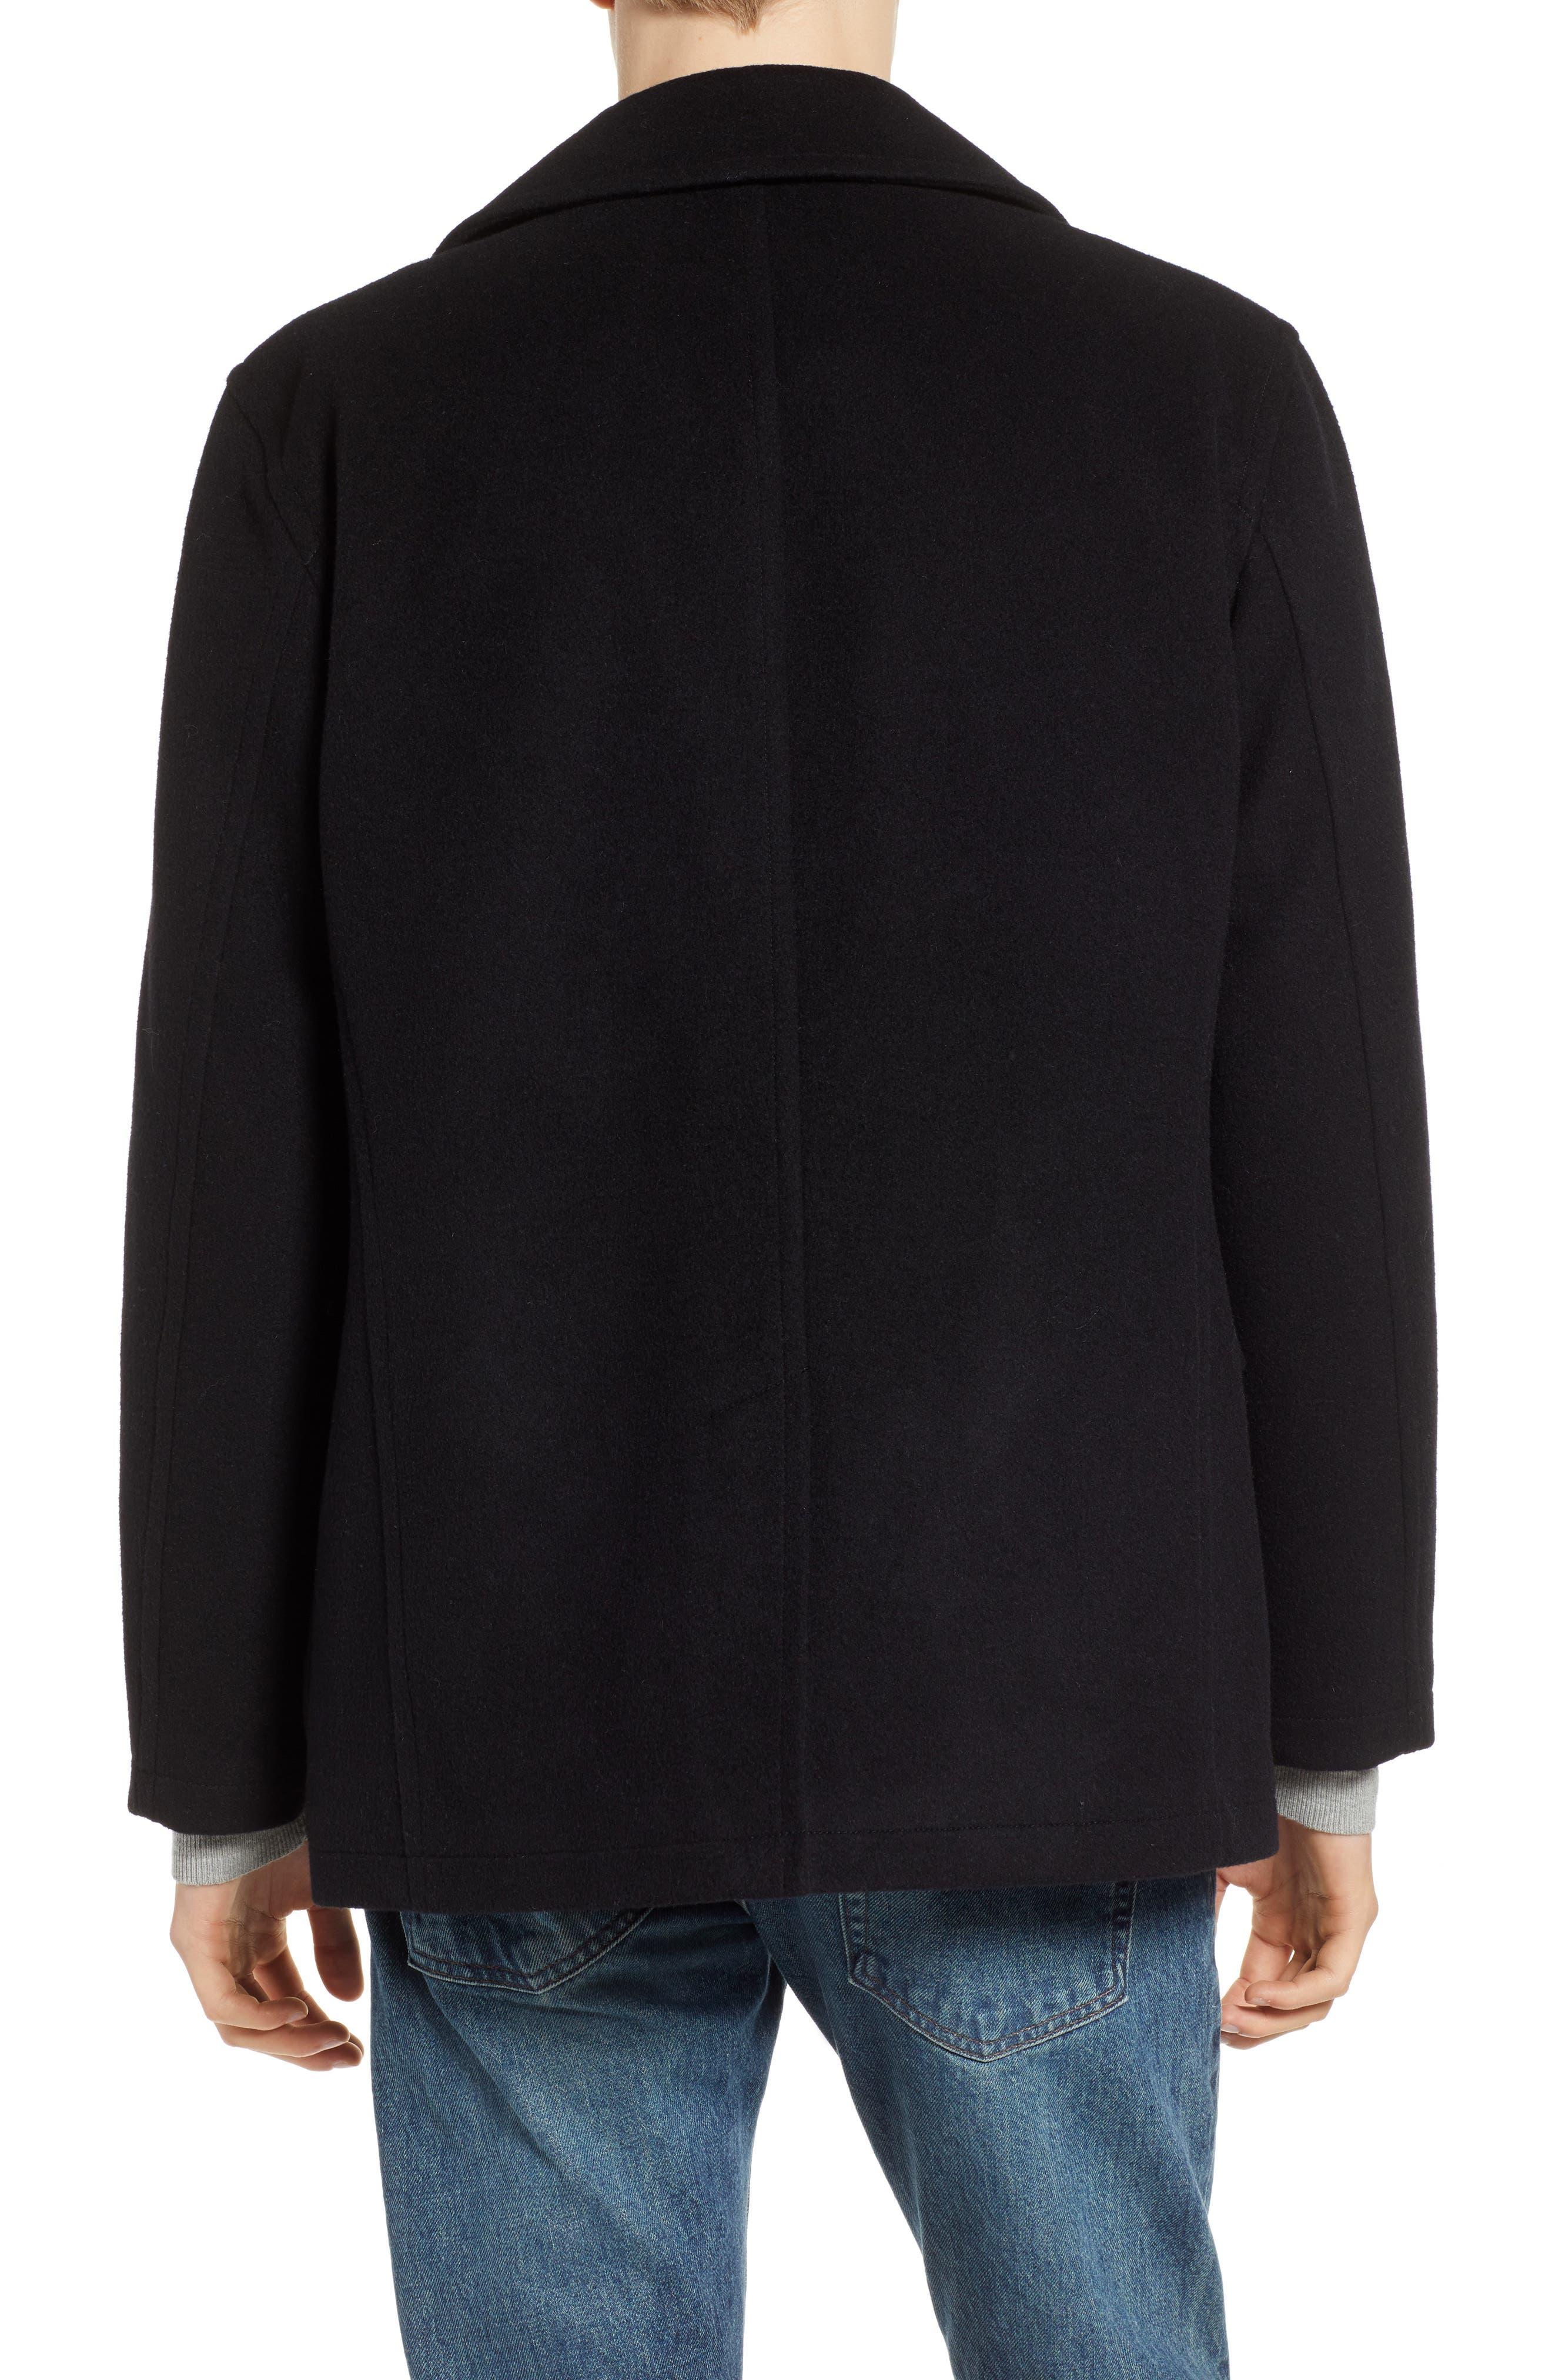 PENDLETON, Maritime Wool Blend Peacoat, Alternate thumbnail 2, color, BLACK